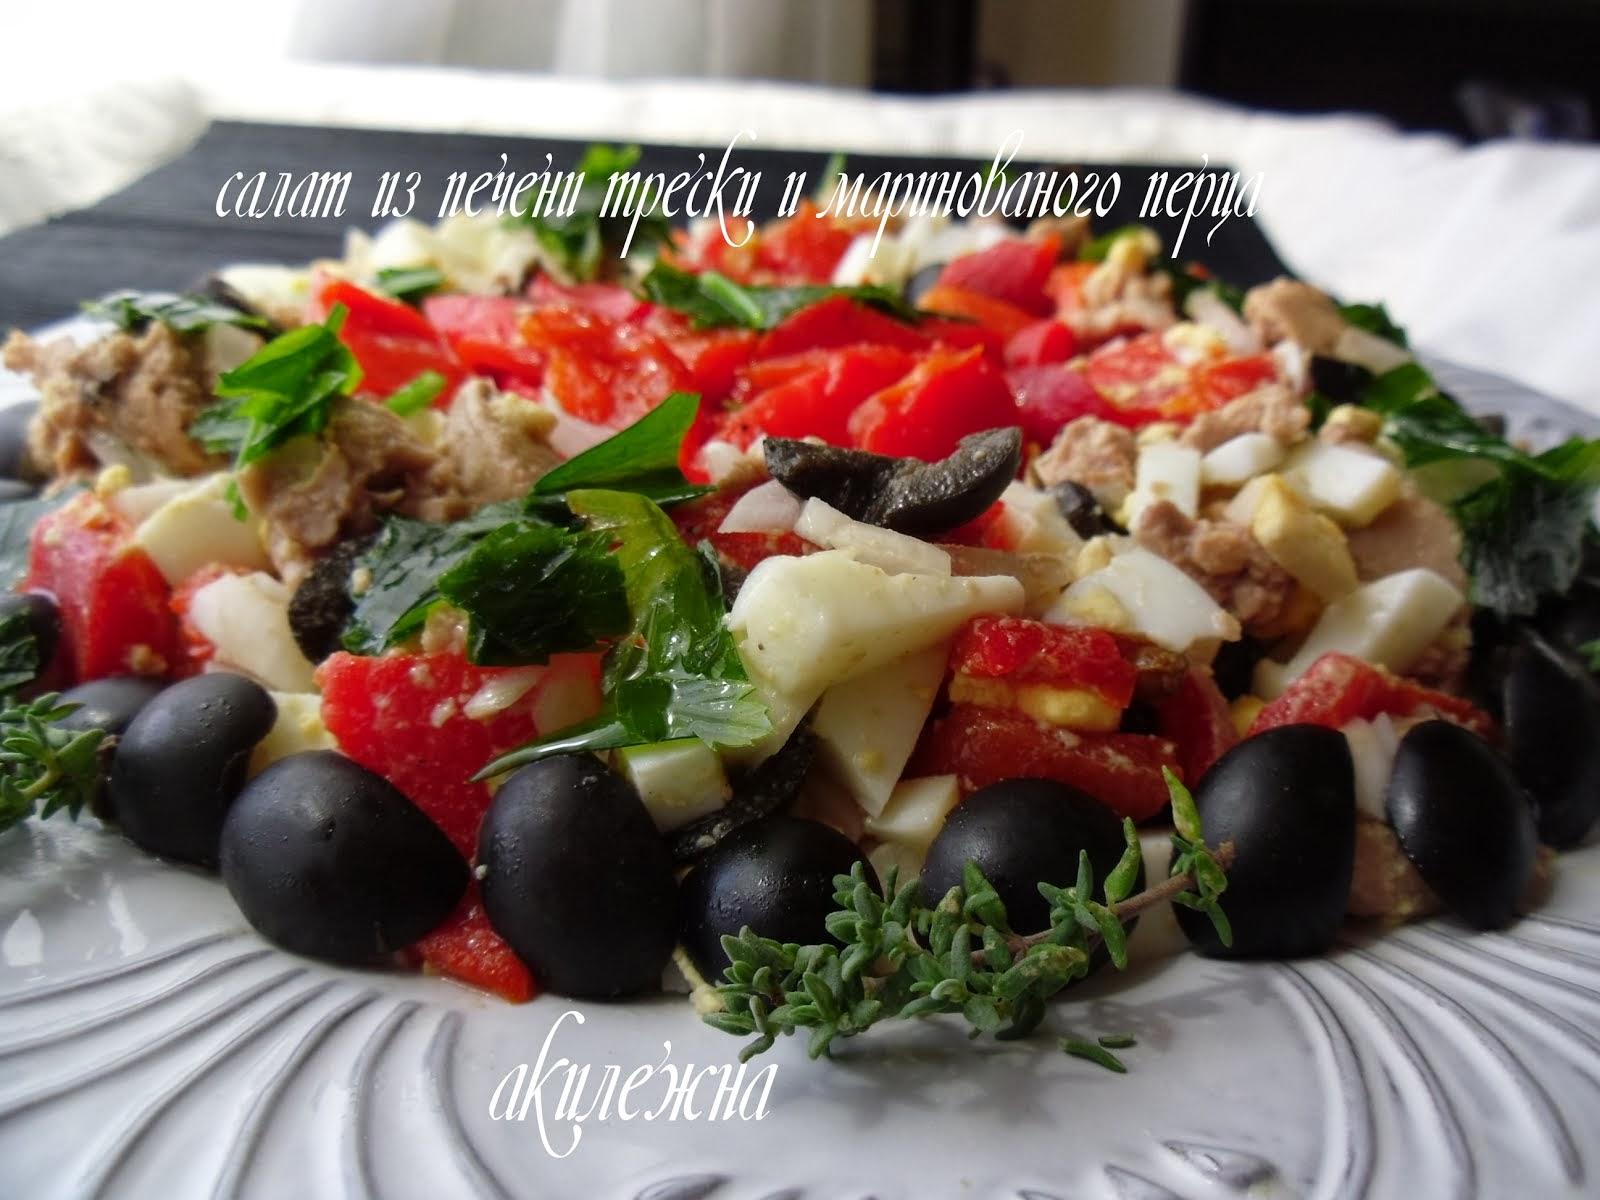 Салат из печени трески и маринованого перца